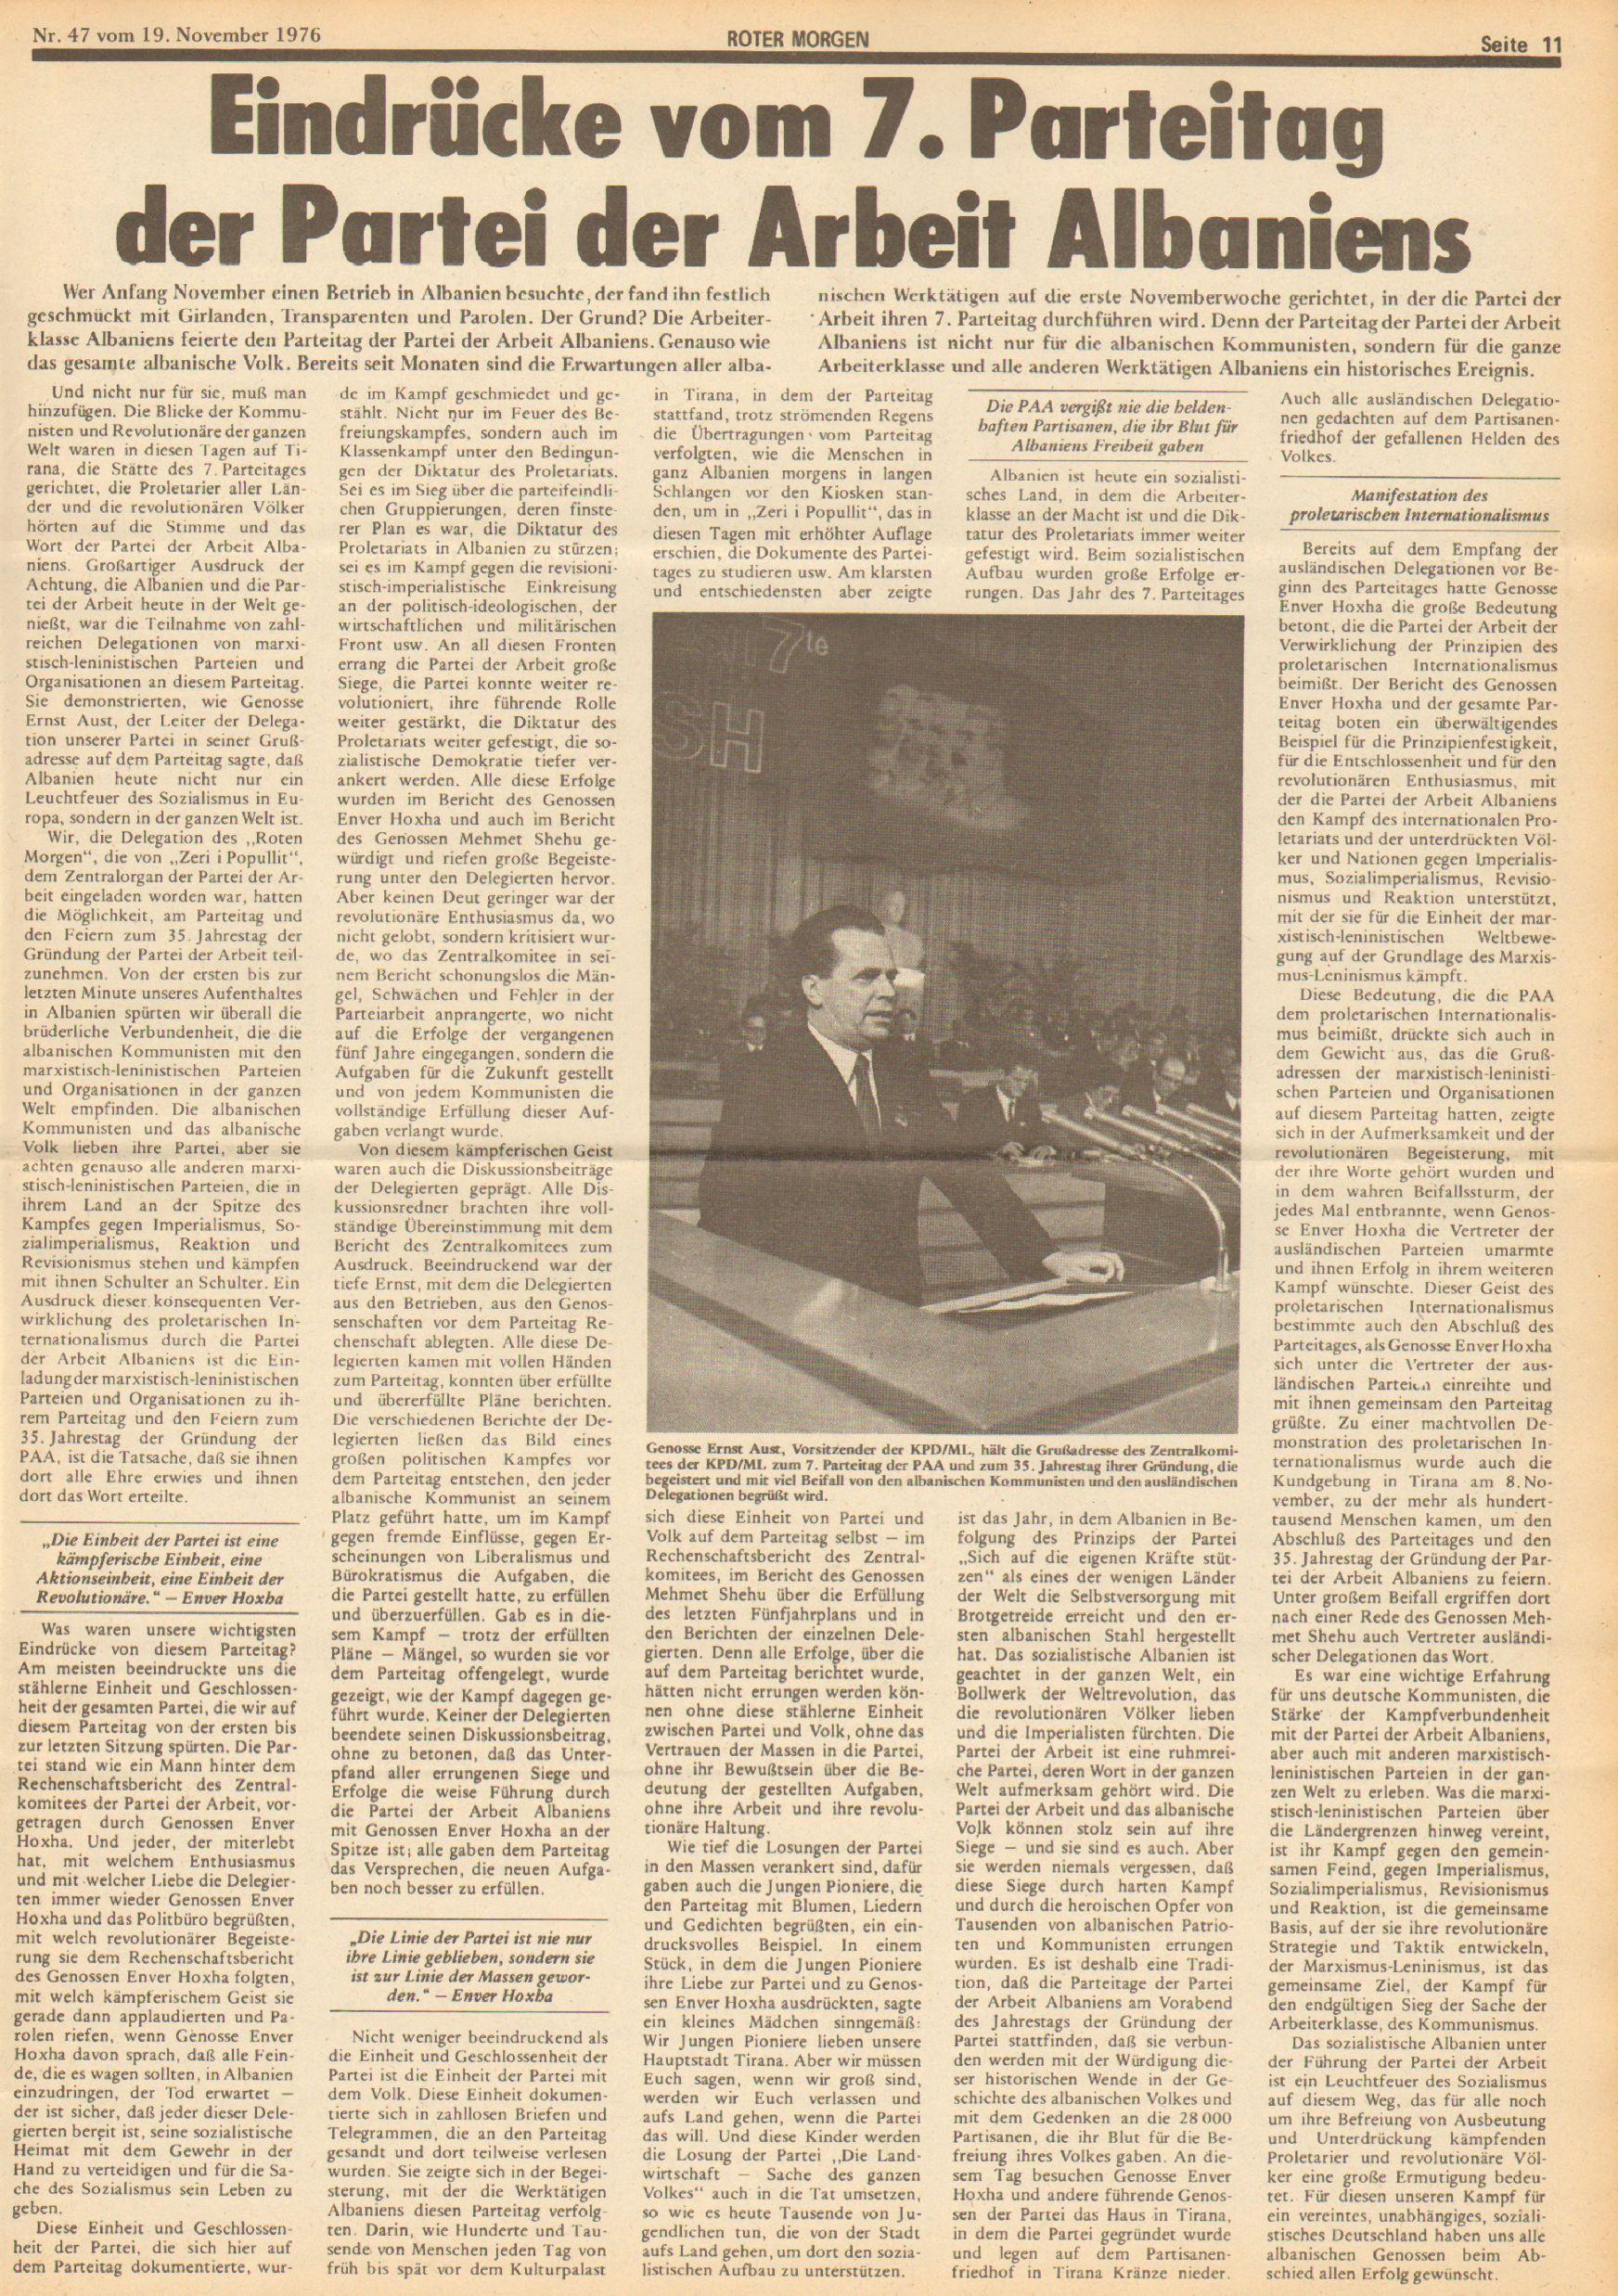 Roter Morgen, 10. Jg., 19. November 1976, Nr. 47, Seite 11